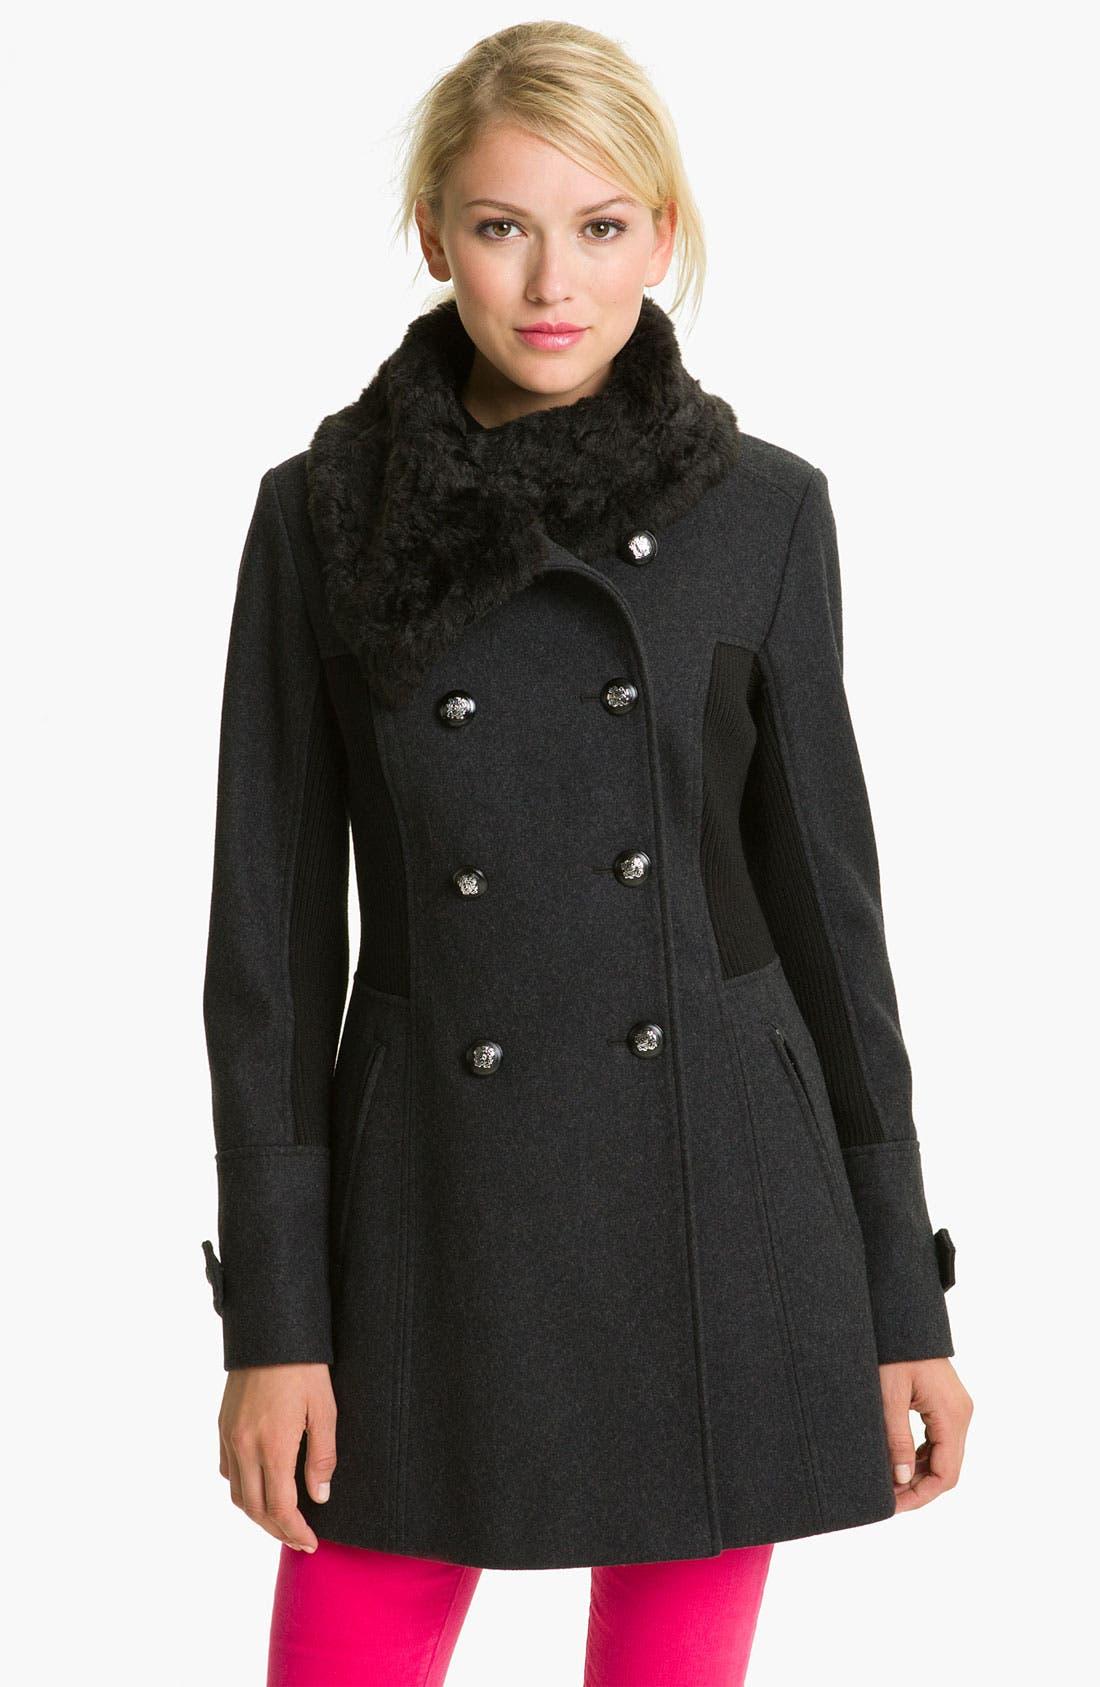 Alternate Image 1 Selected - GUESS Faux Fur & Knit Trim Coat